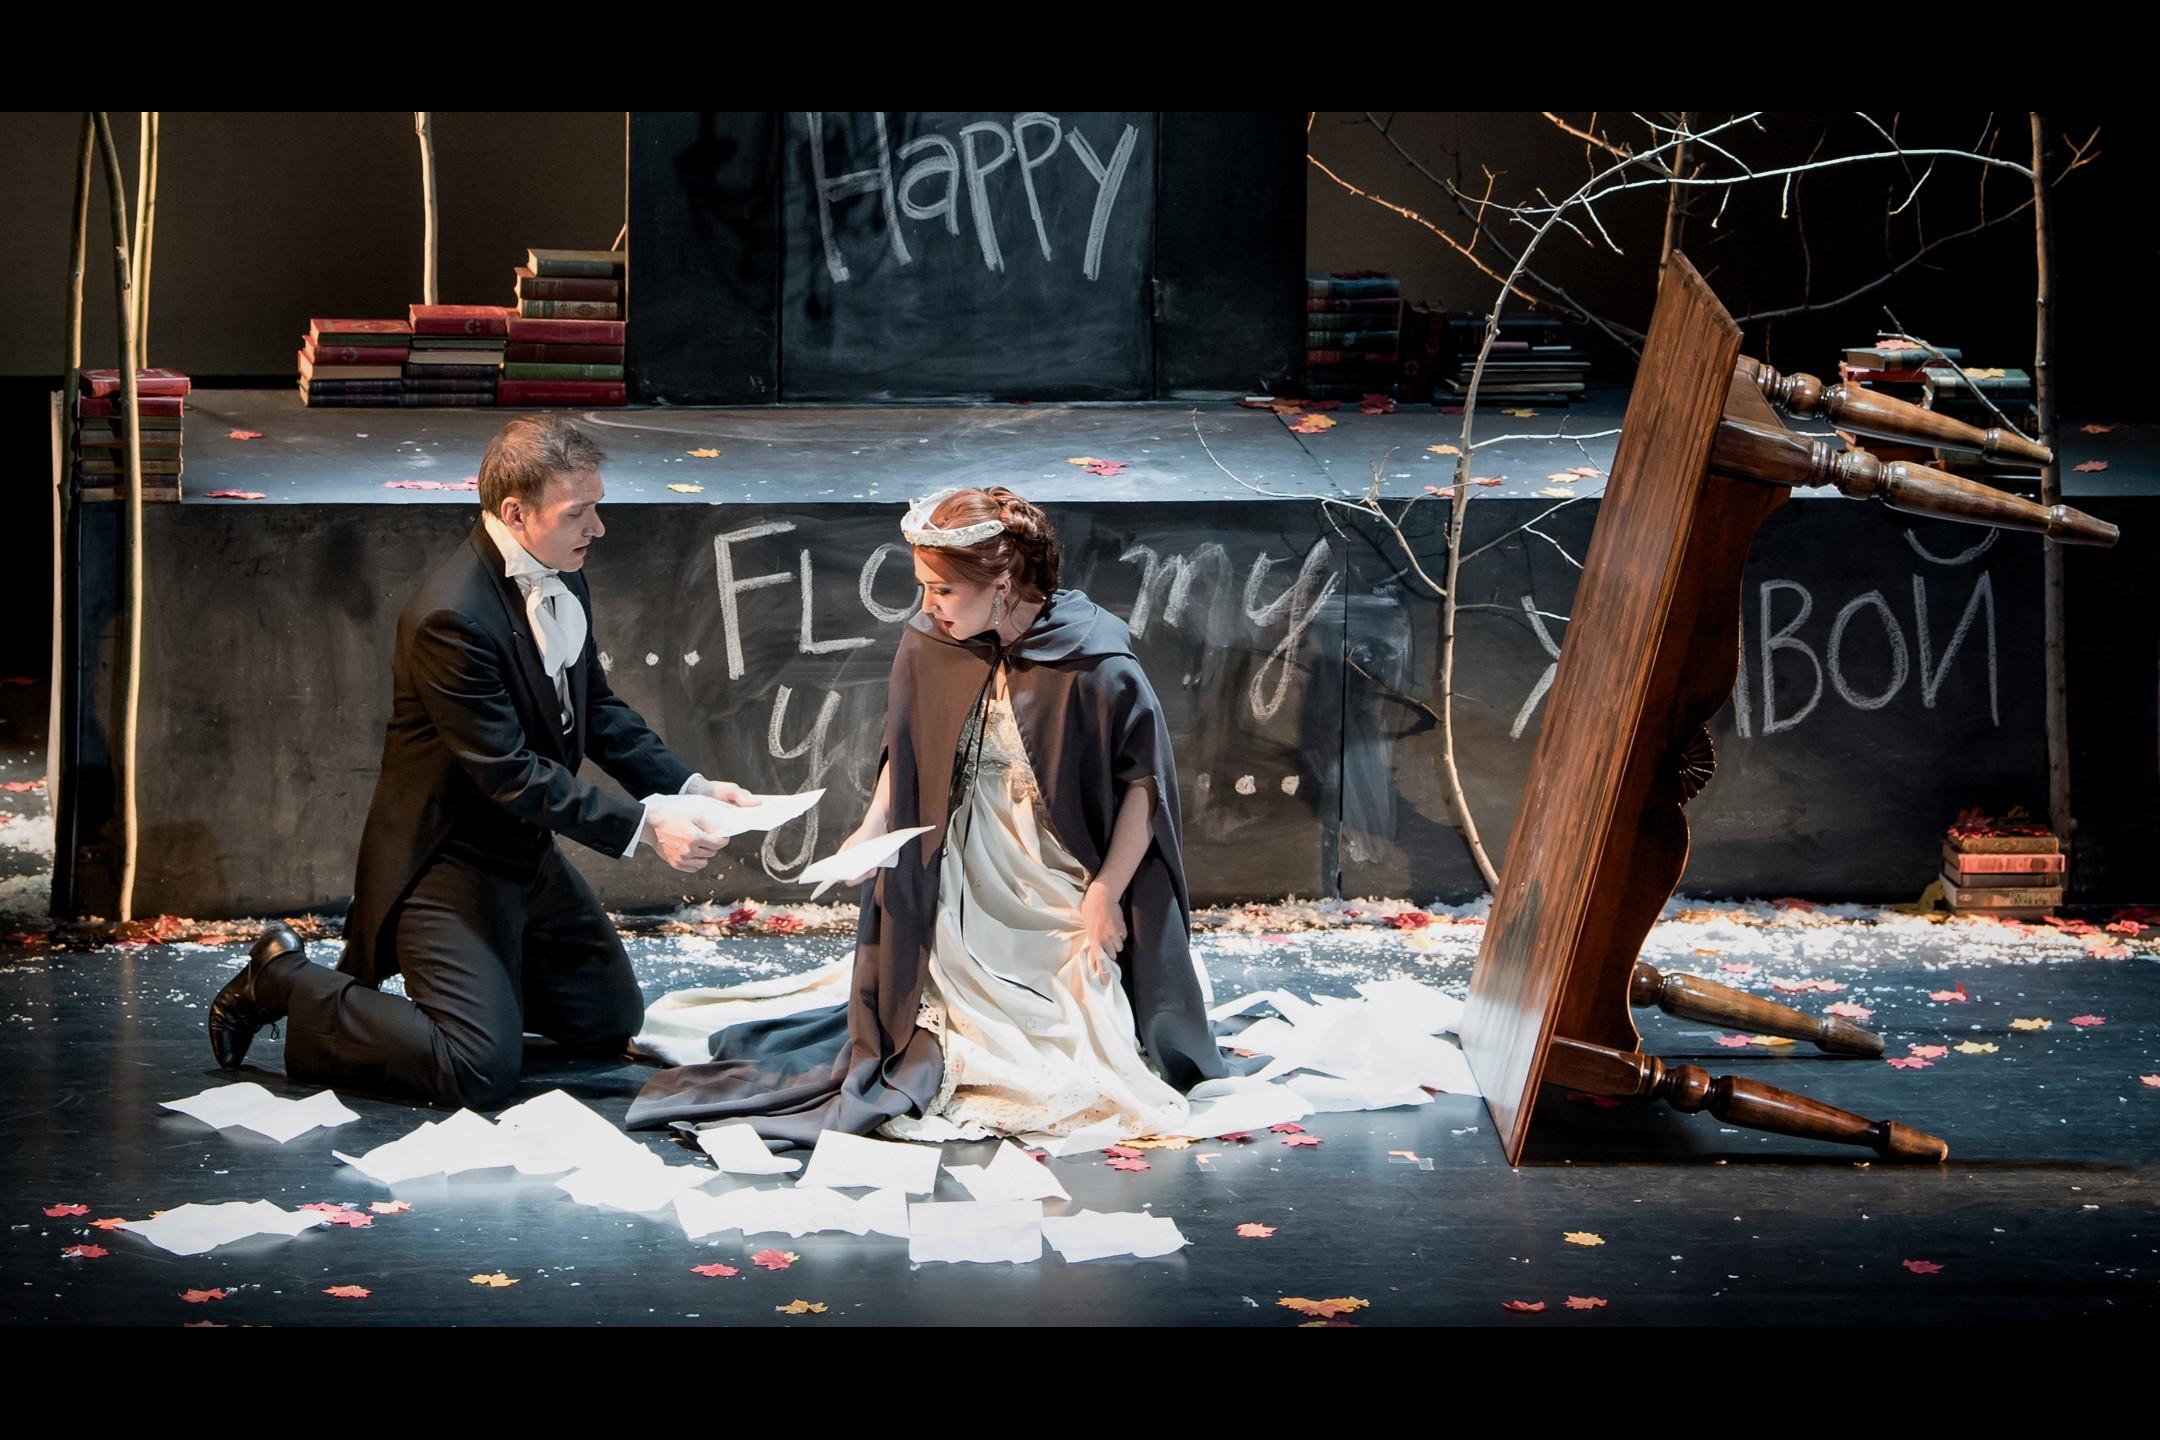 Tatiyana & Lensky from Intermountain Opera's Eugene Onegin